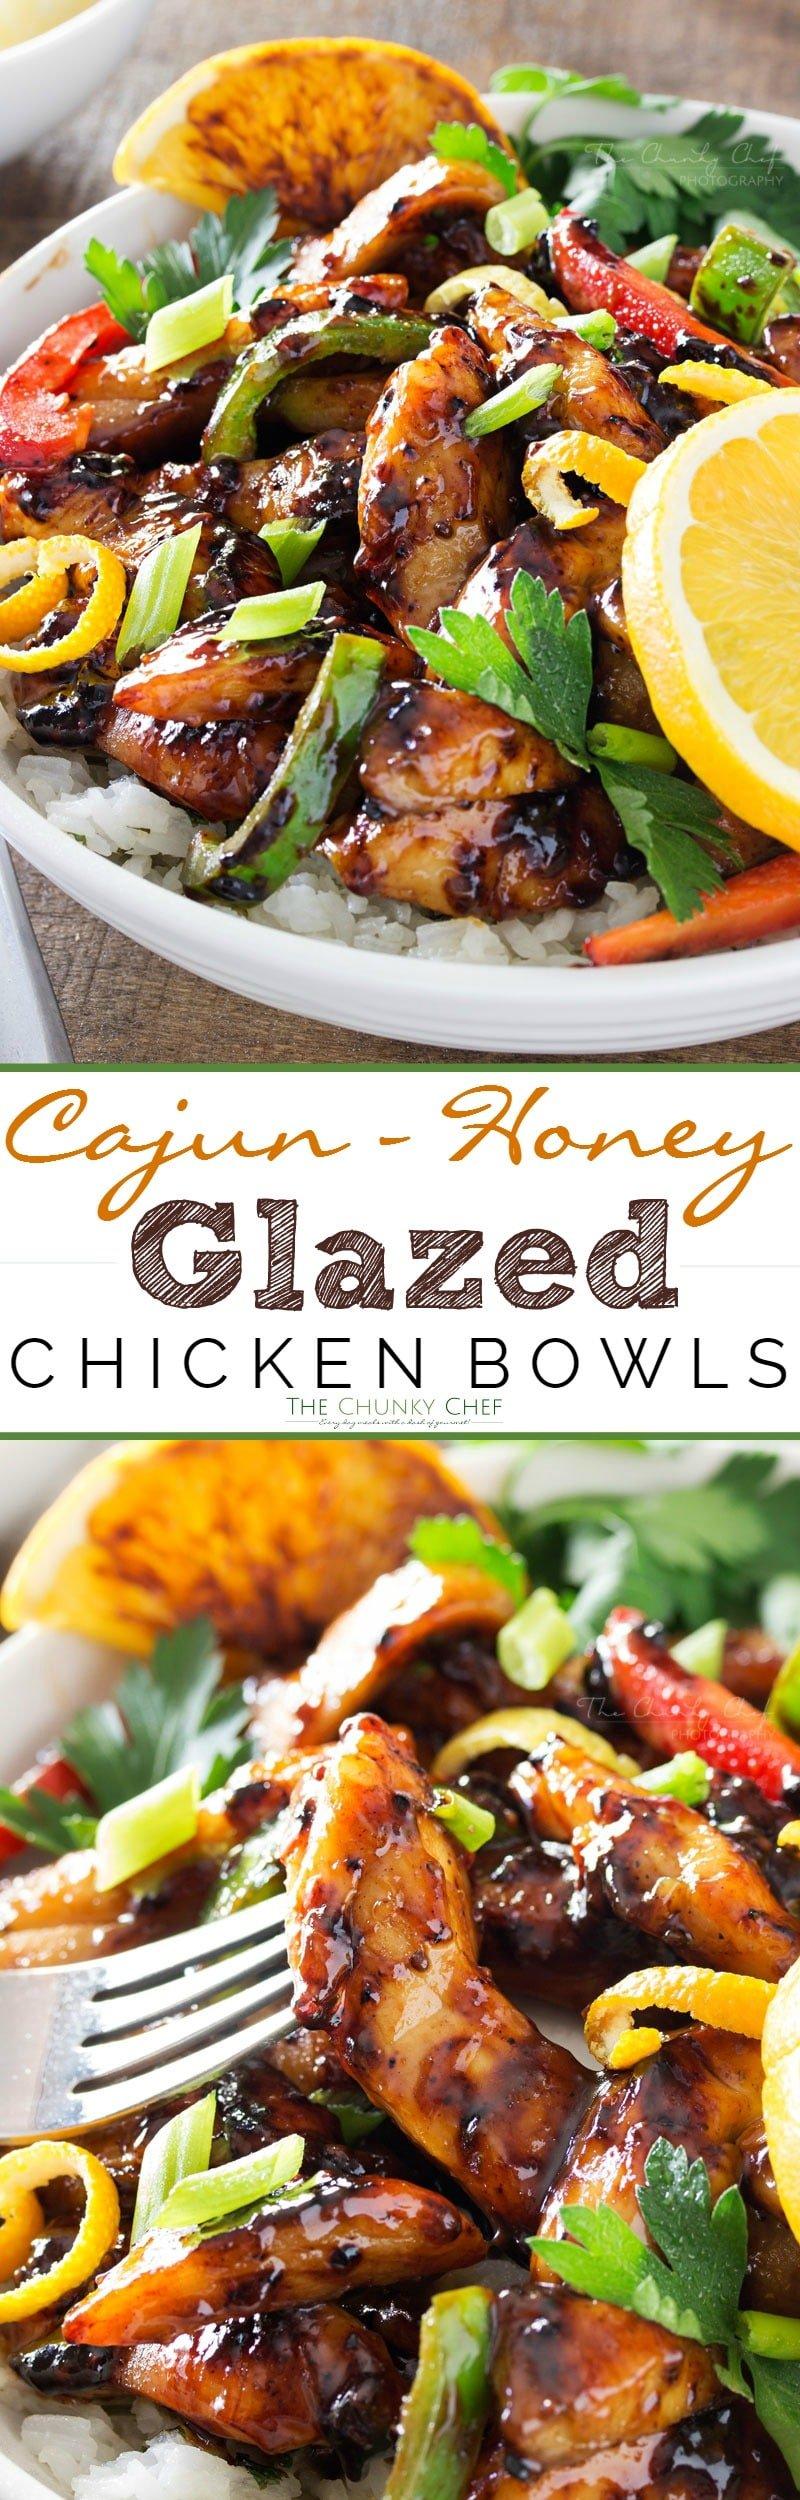 how to make honey chicken wings glazed